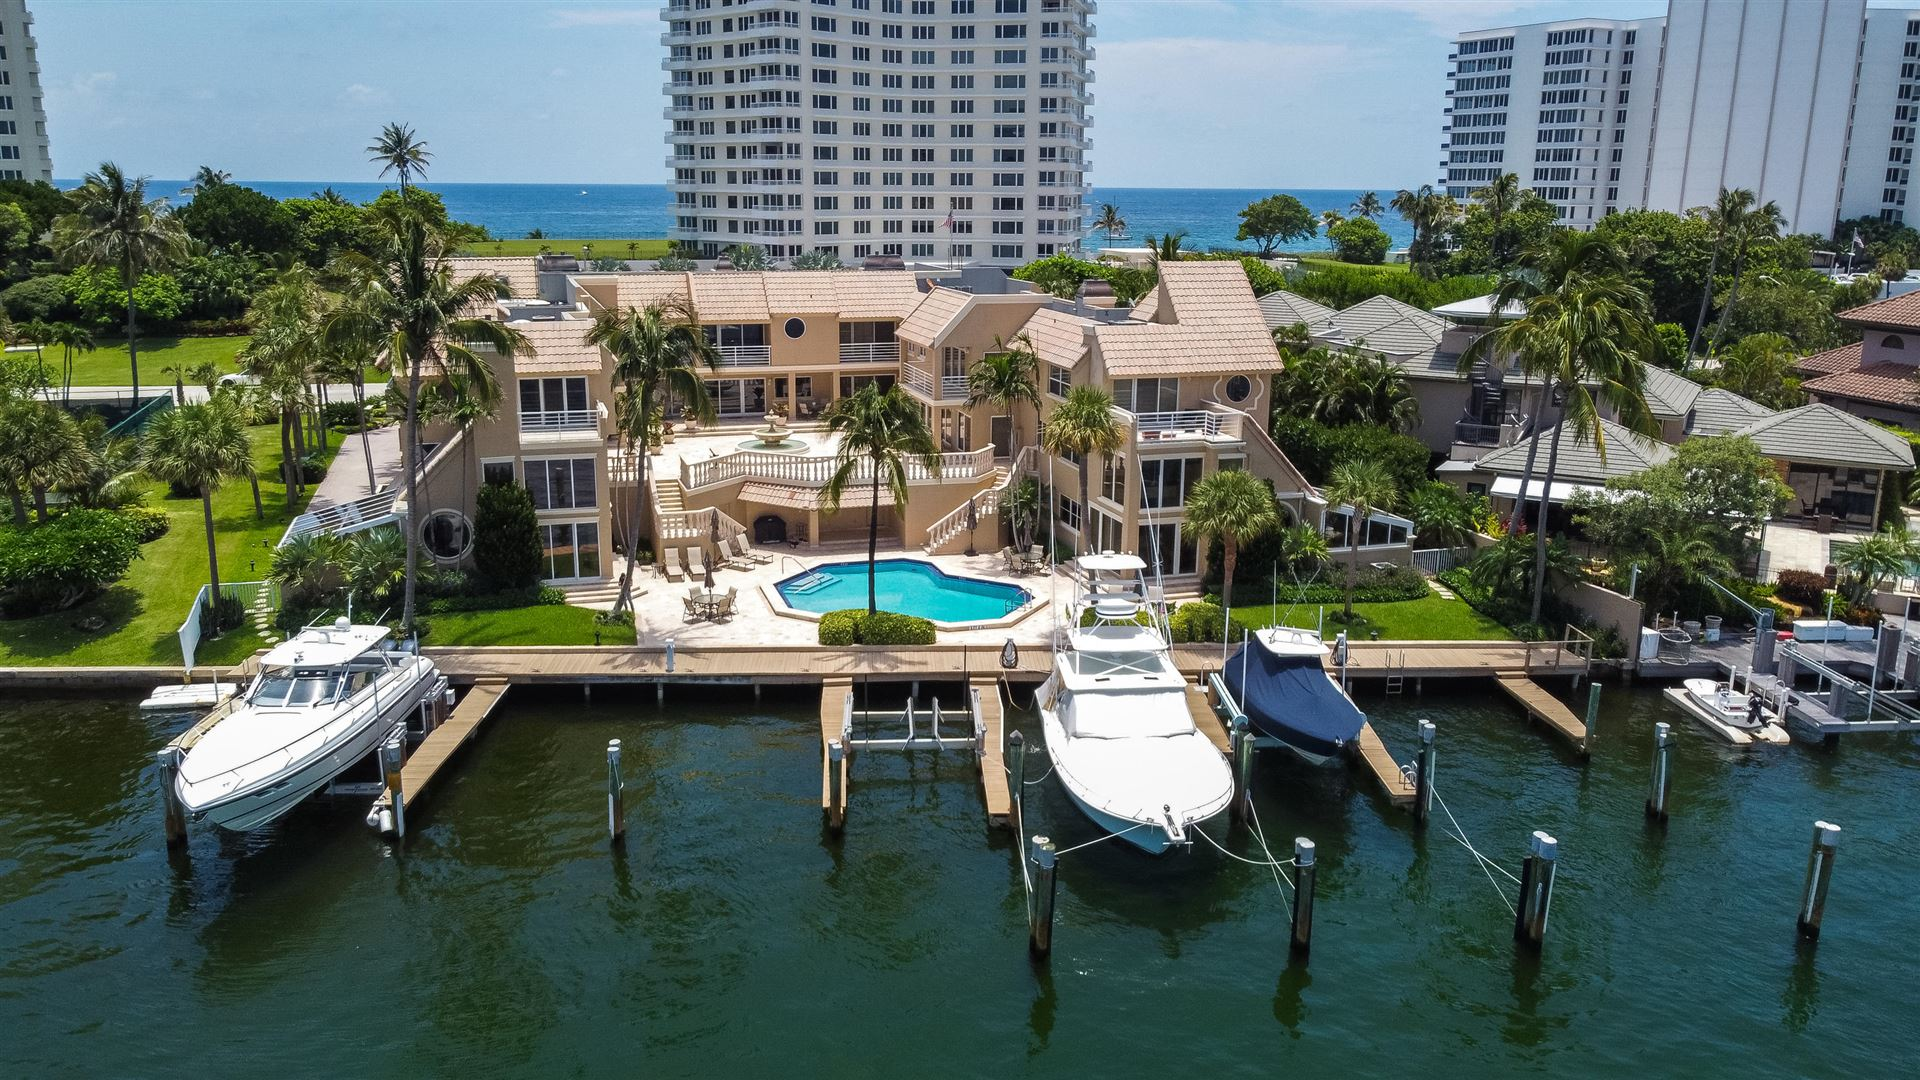 555 S Ocean Boulevard #4, Boca Raton, FL 33432 - #: RX-10631348